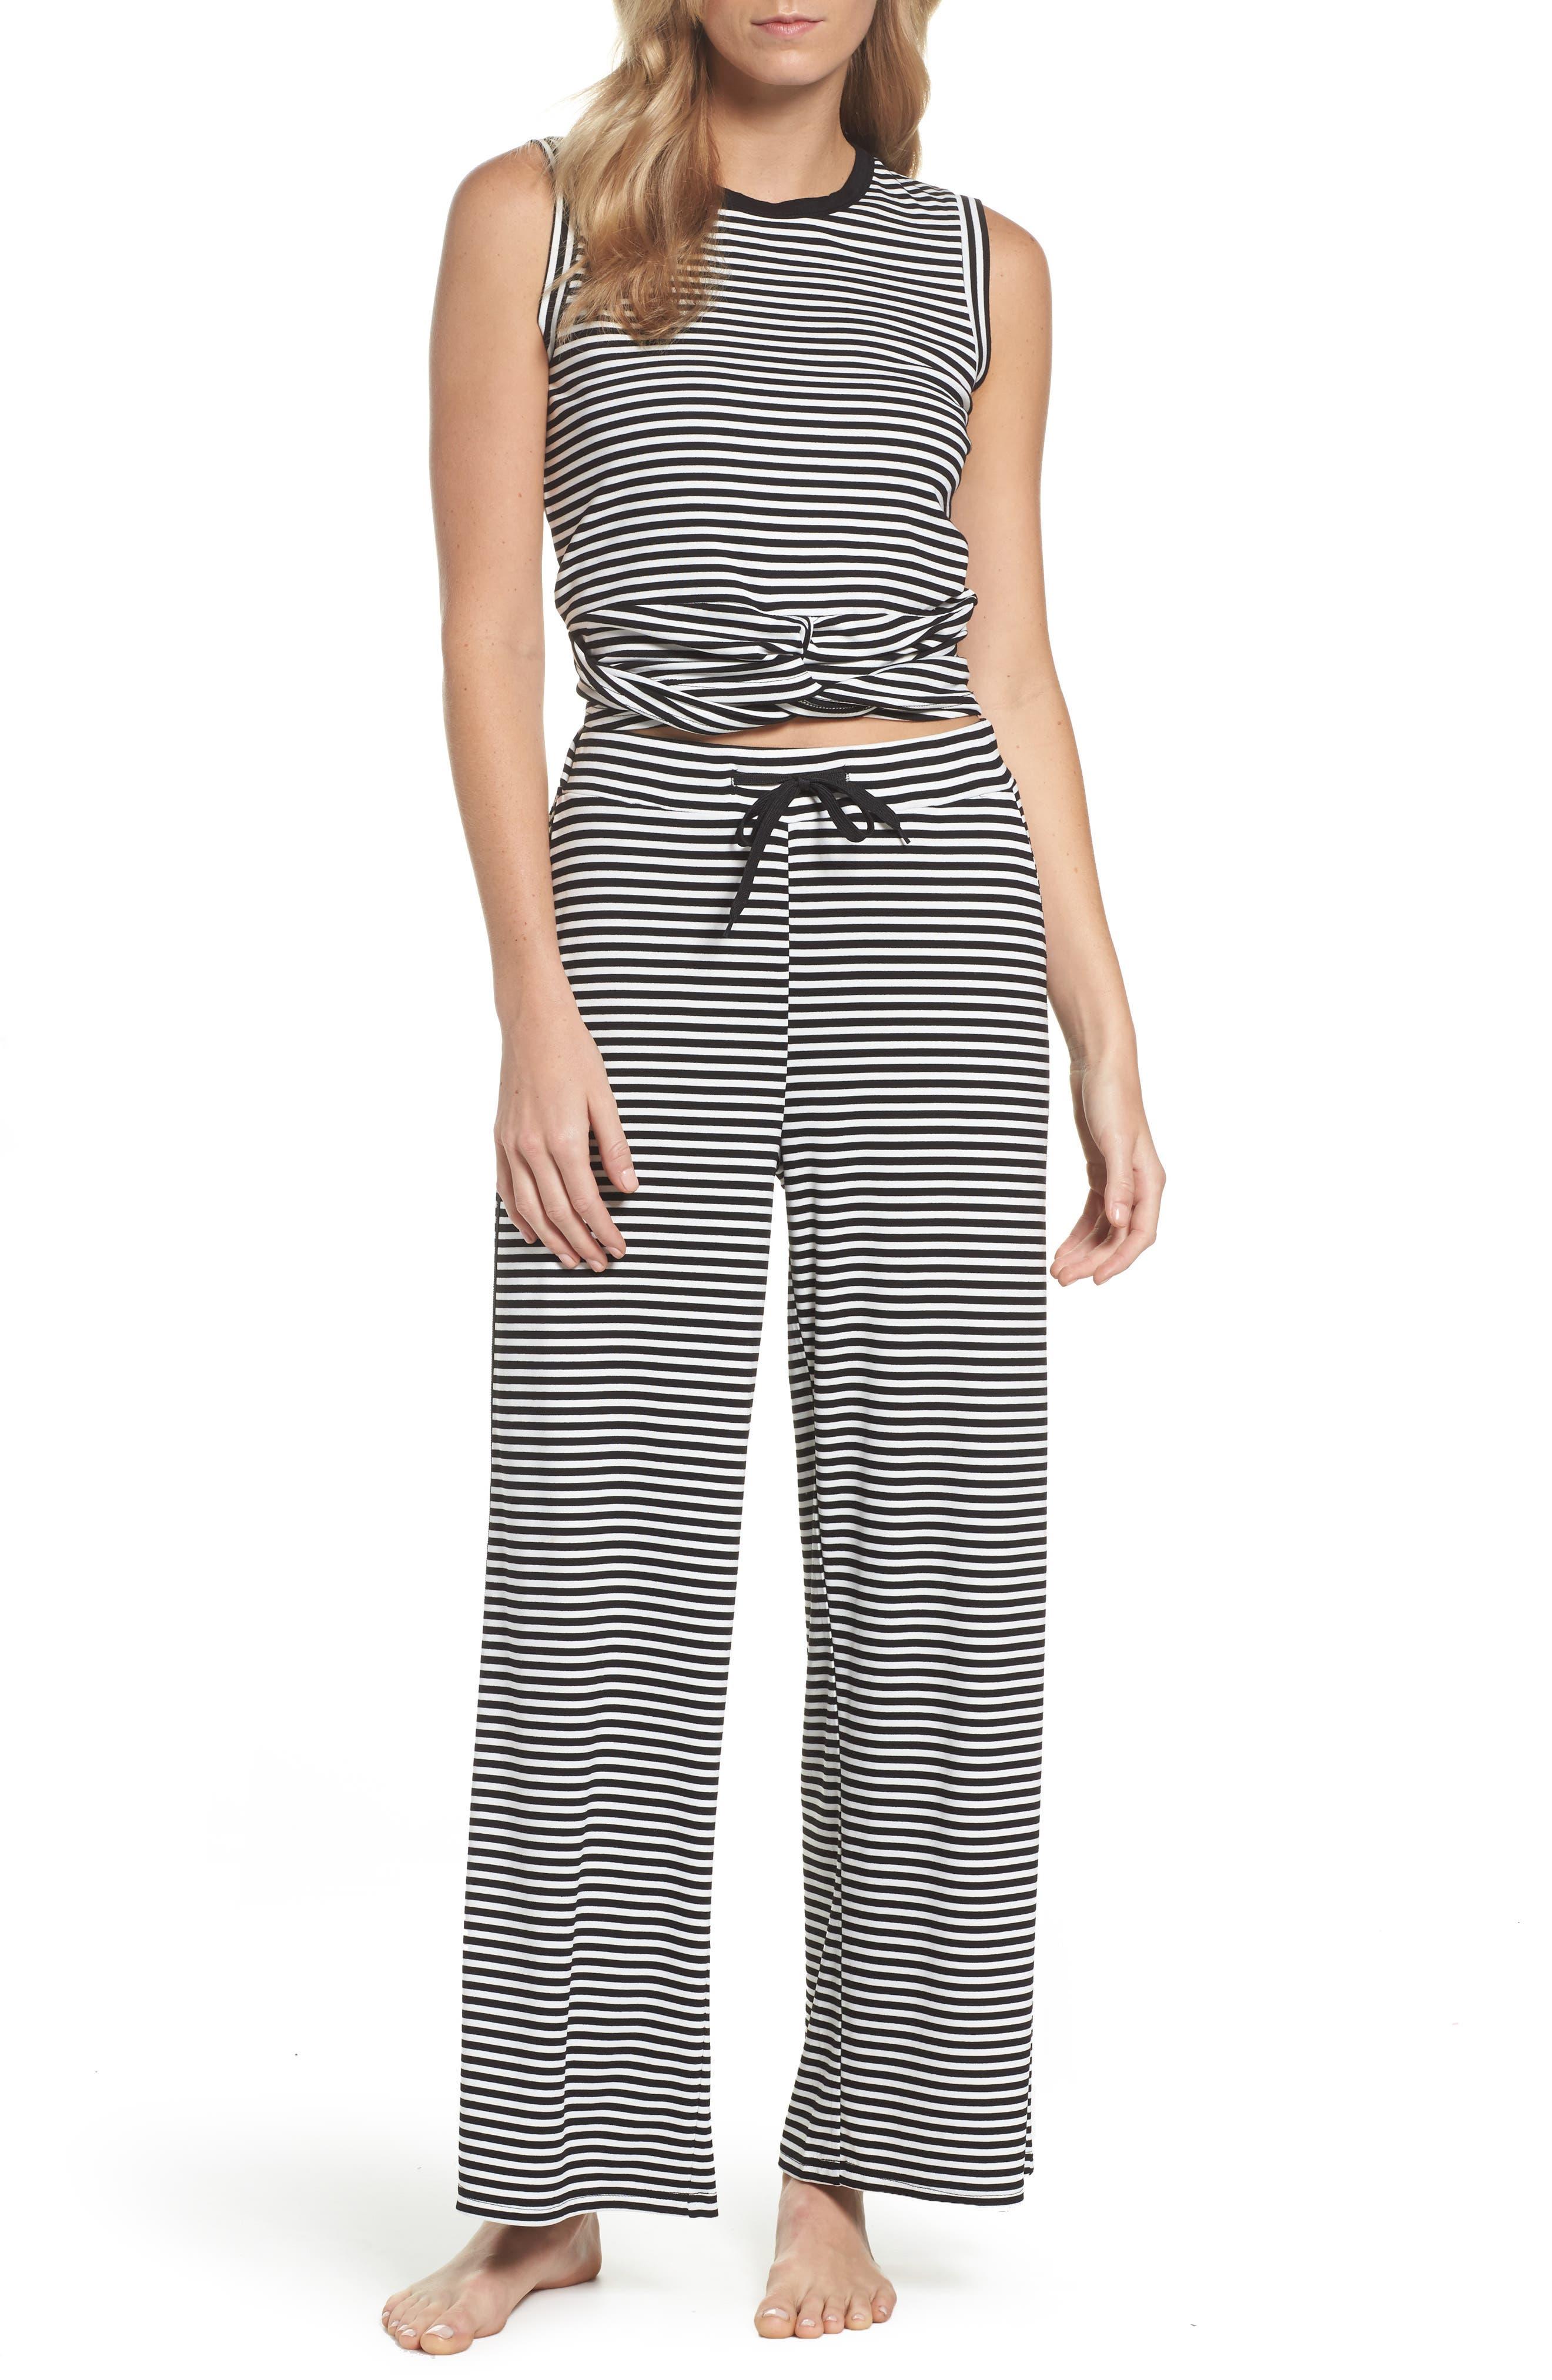 Stripe Pajamas,                             Main thumbnail 1, color,                             BLACK/ WHITE